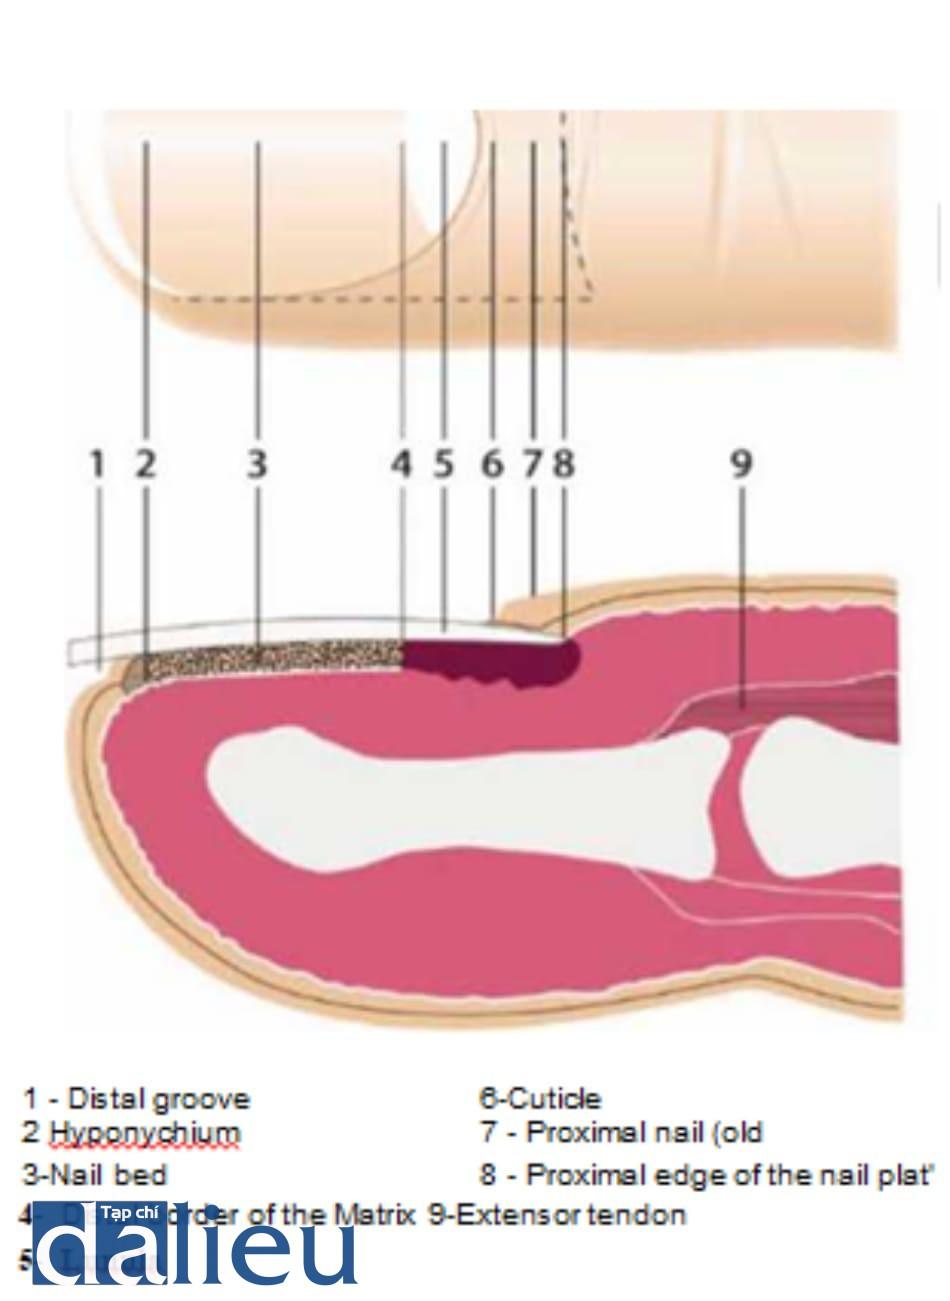 Fig. 14.2 Nail anatomy